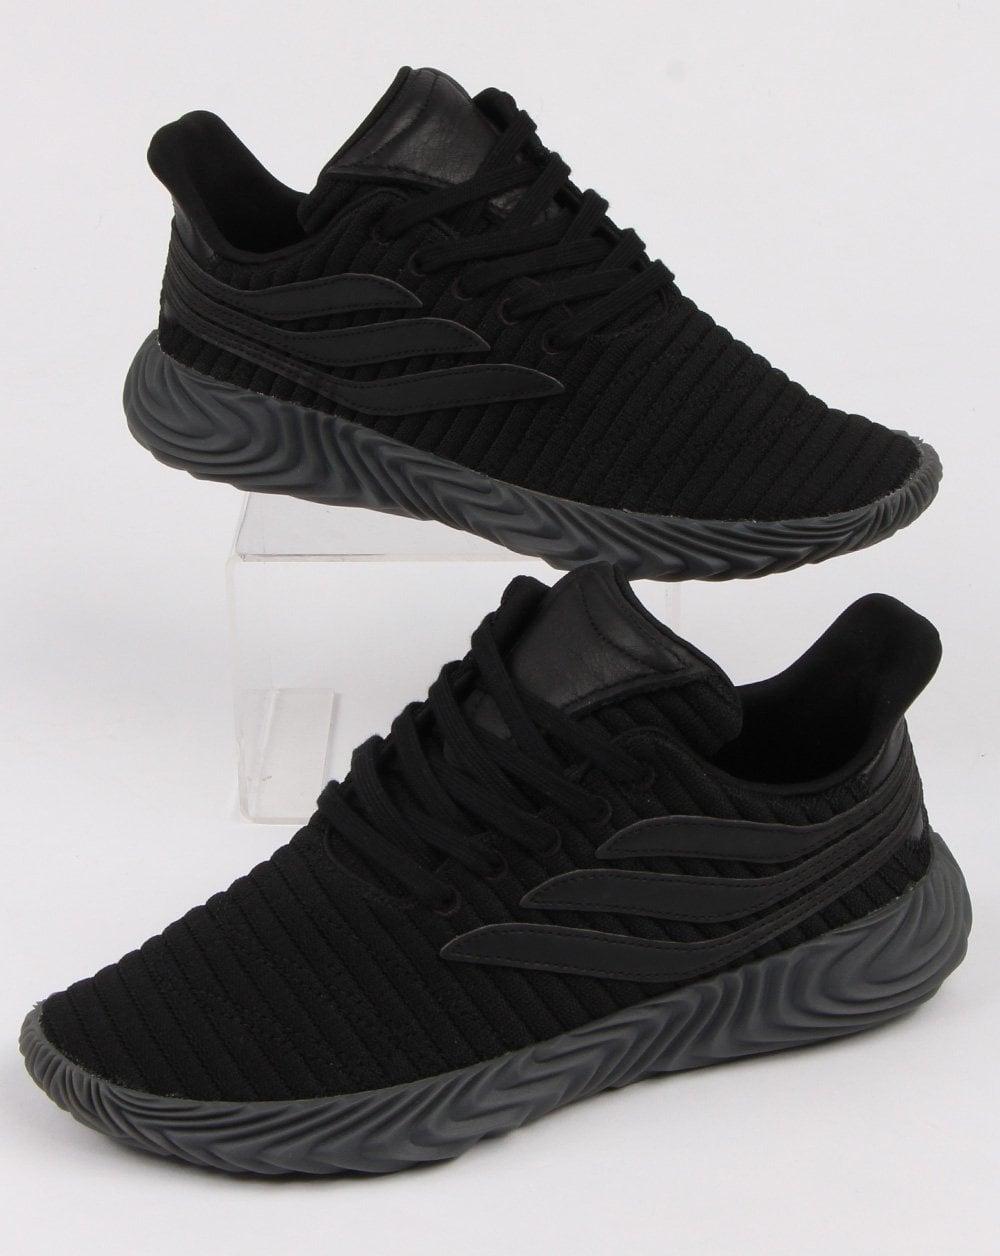 pretty nice 1a4af 41643 adidas Trainers Adidas Sobakov Trainers Triple Black